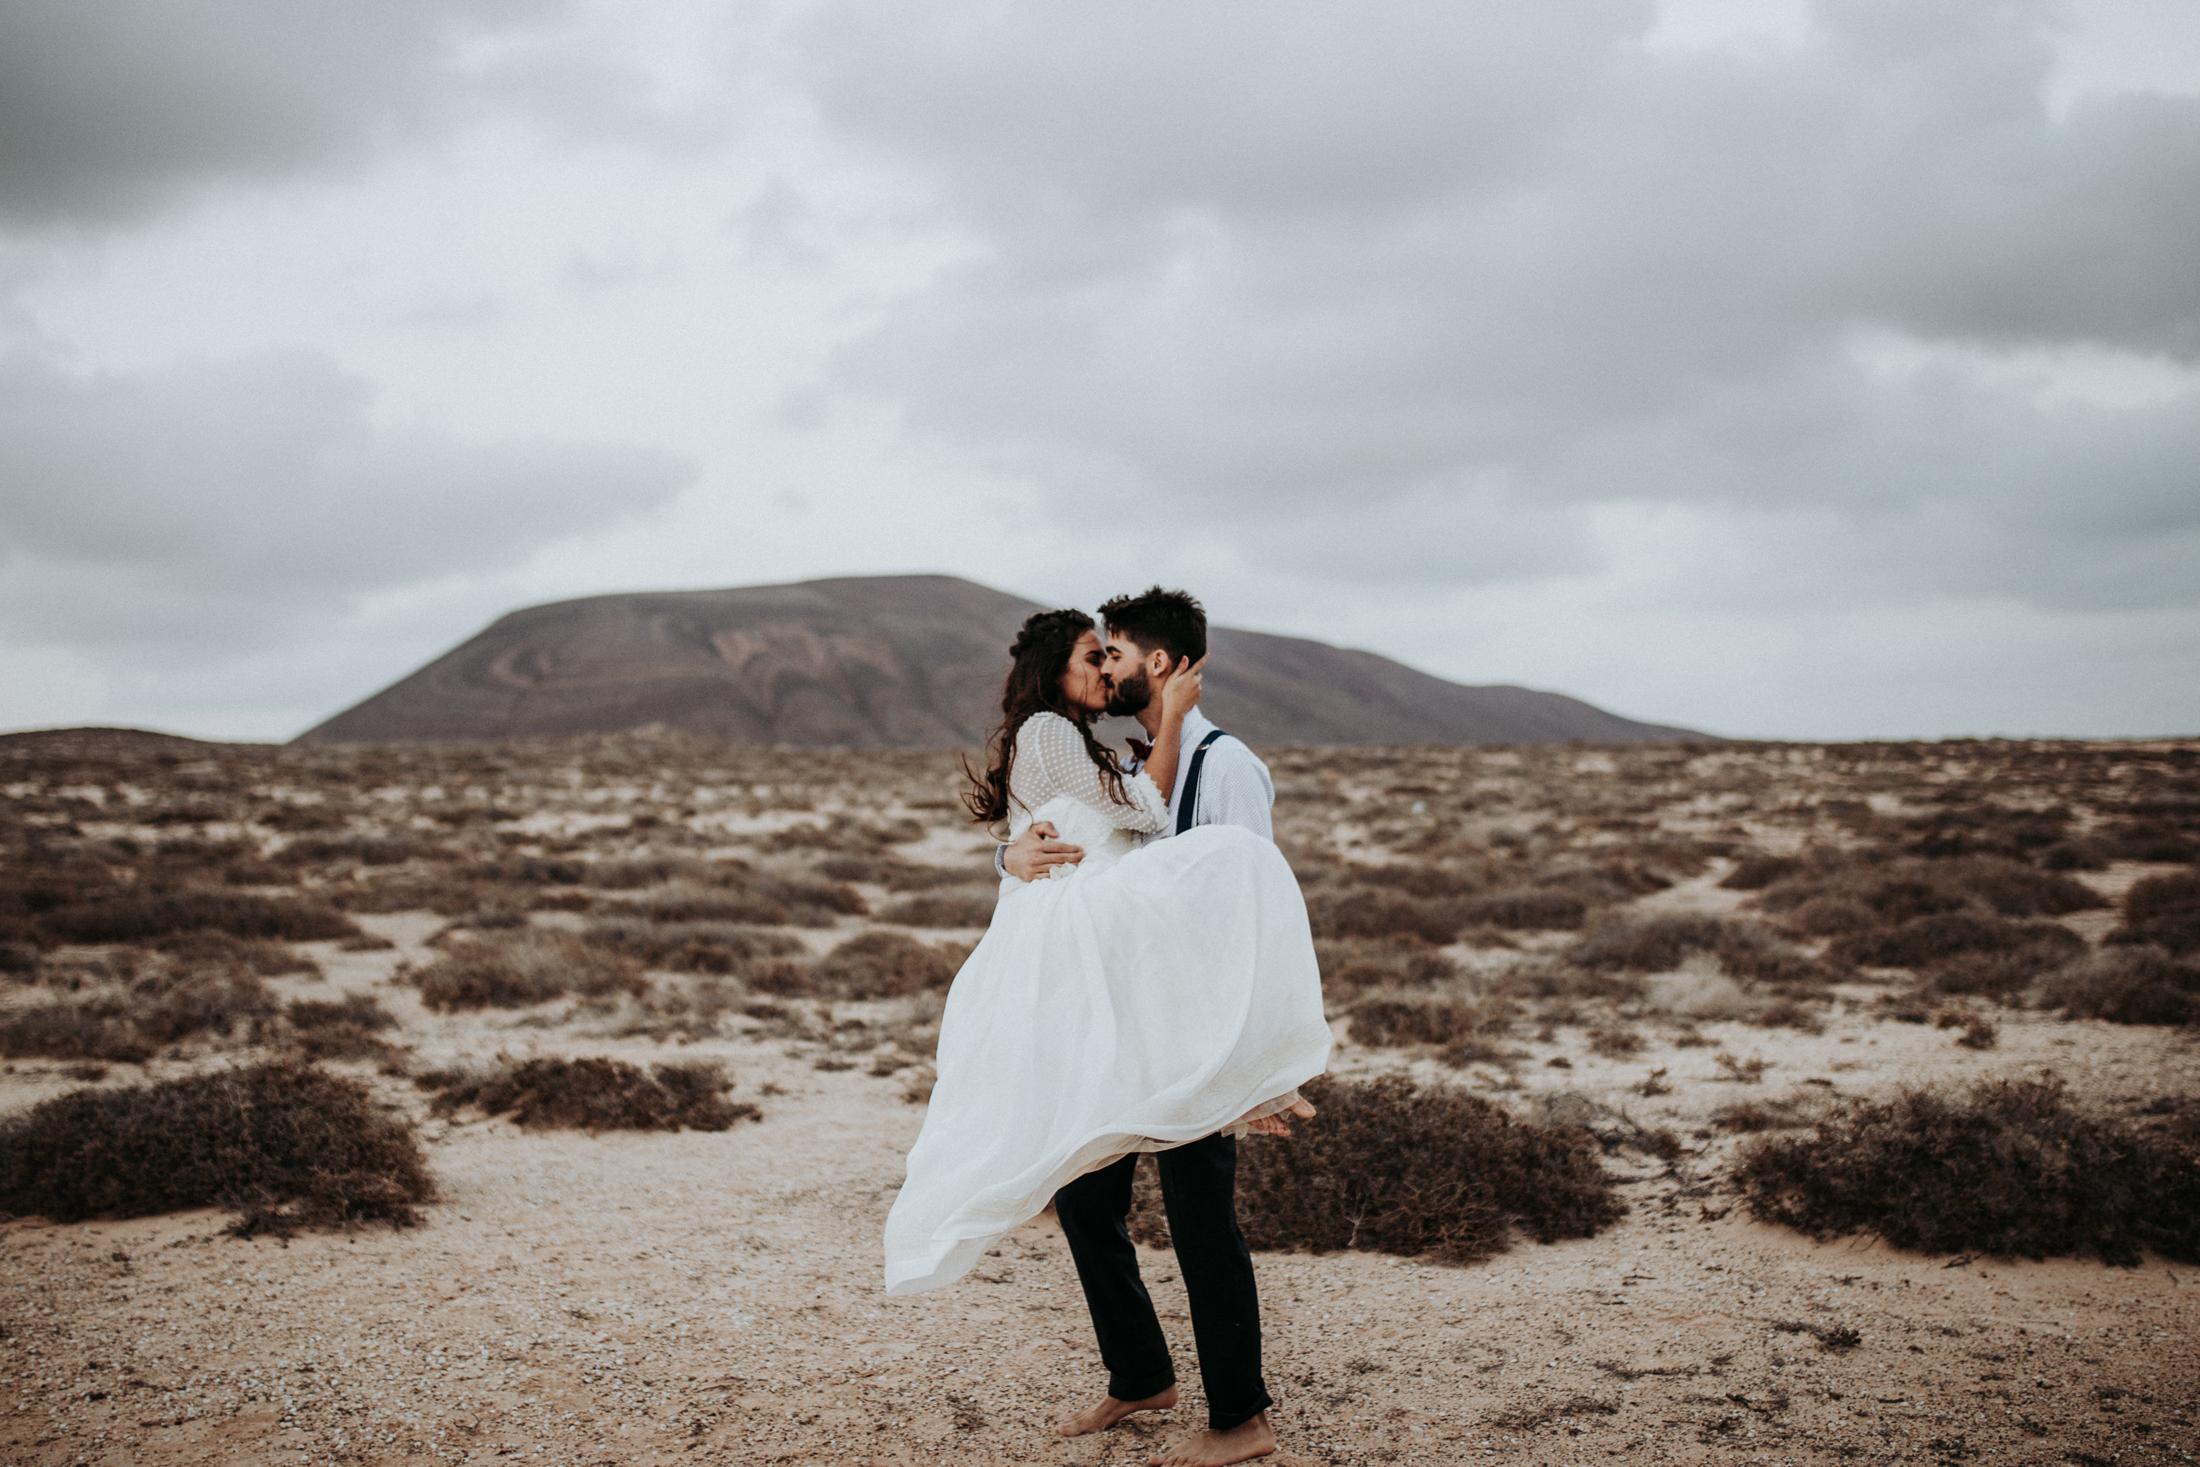 Wedding_Photographer_Mallorca_Daniela-Marquardt_Photography_CanaryIslands_Lanzarote_Iceland_Tuskany_Santorini_Portugal_Schweiz_Austria_Bayern_Elopement_Hochzeitsfotograf_31